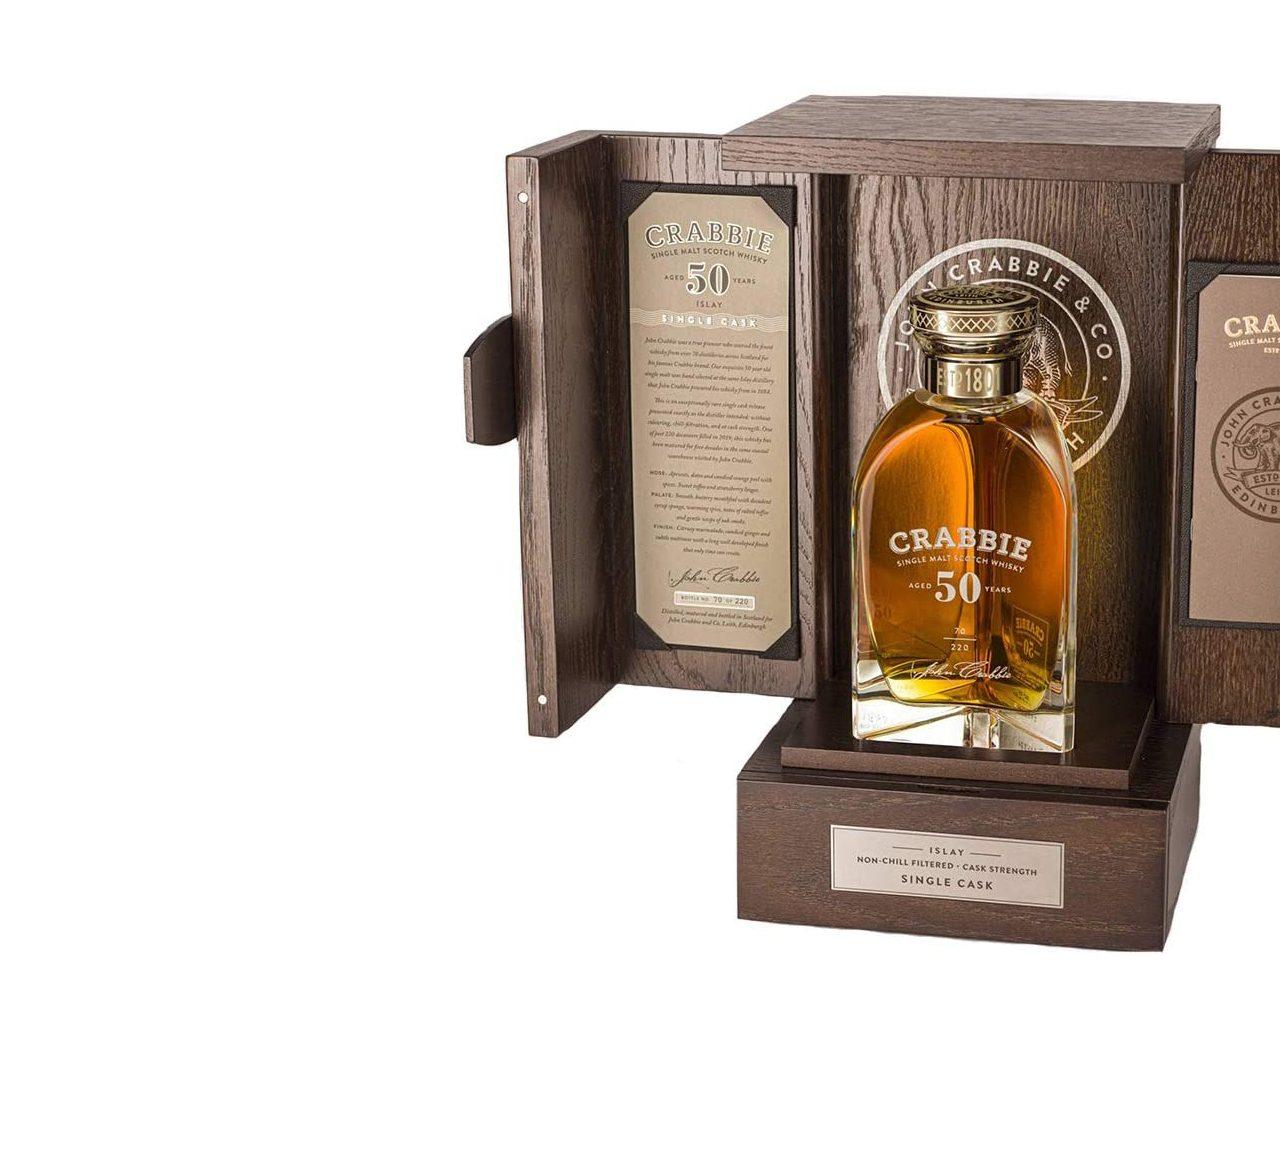 John Crabbie Unveils Limited Edition Rare 50 Year Old Single Malt